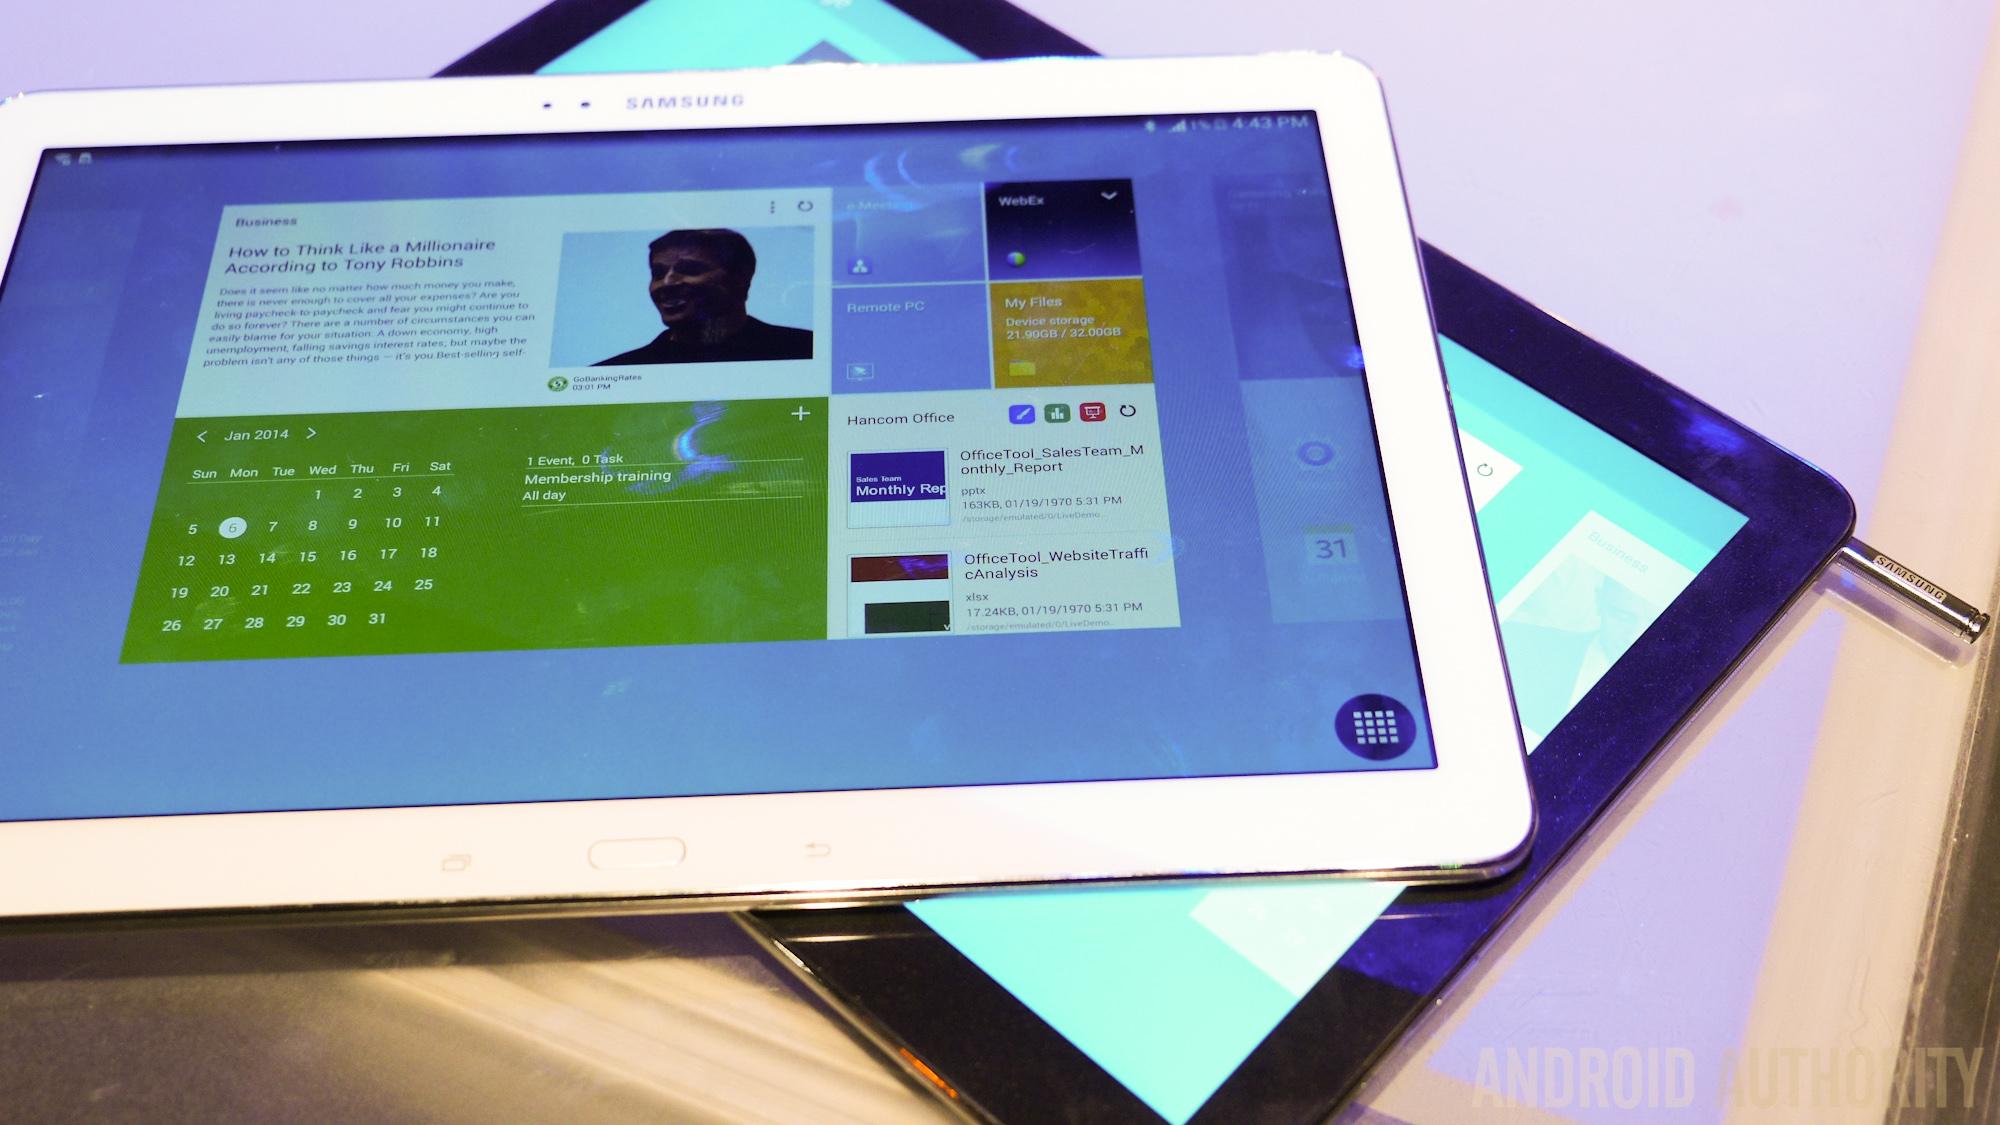 Galaxy TabPro12.2 vs GalaxyNotePro 12.2